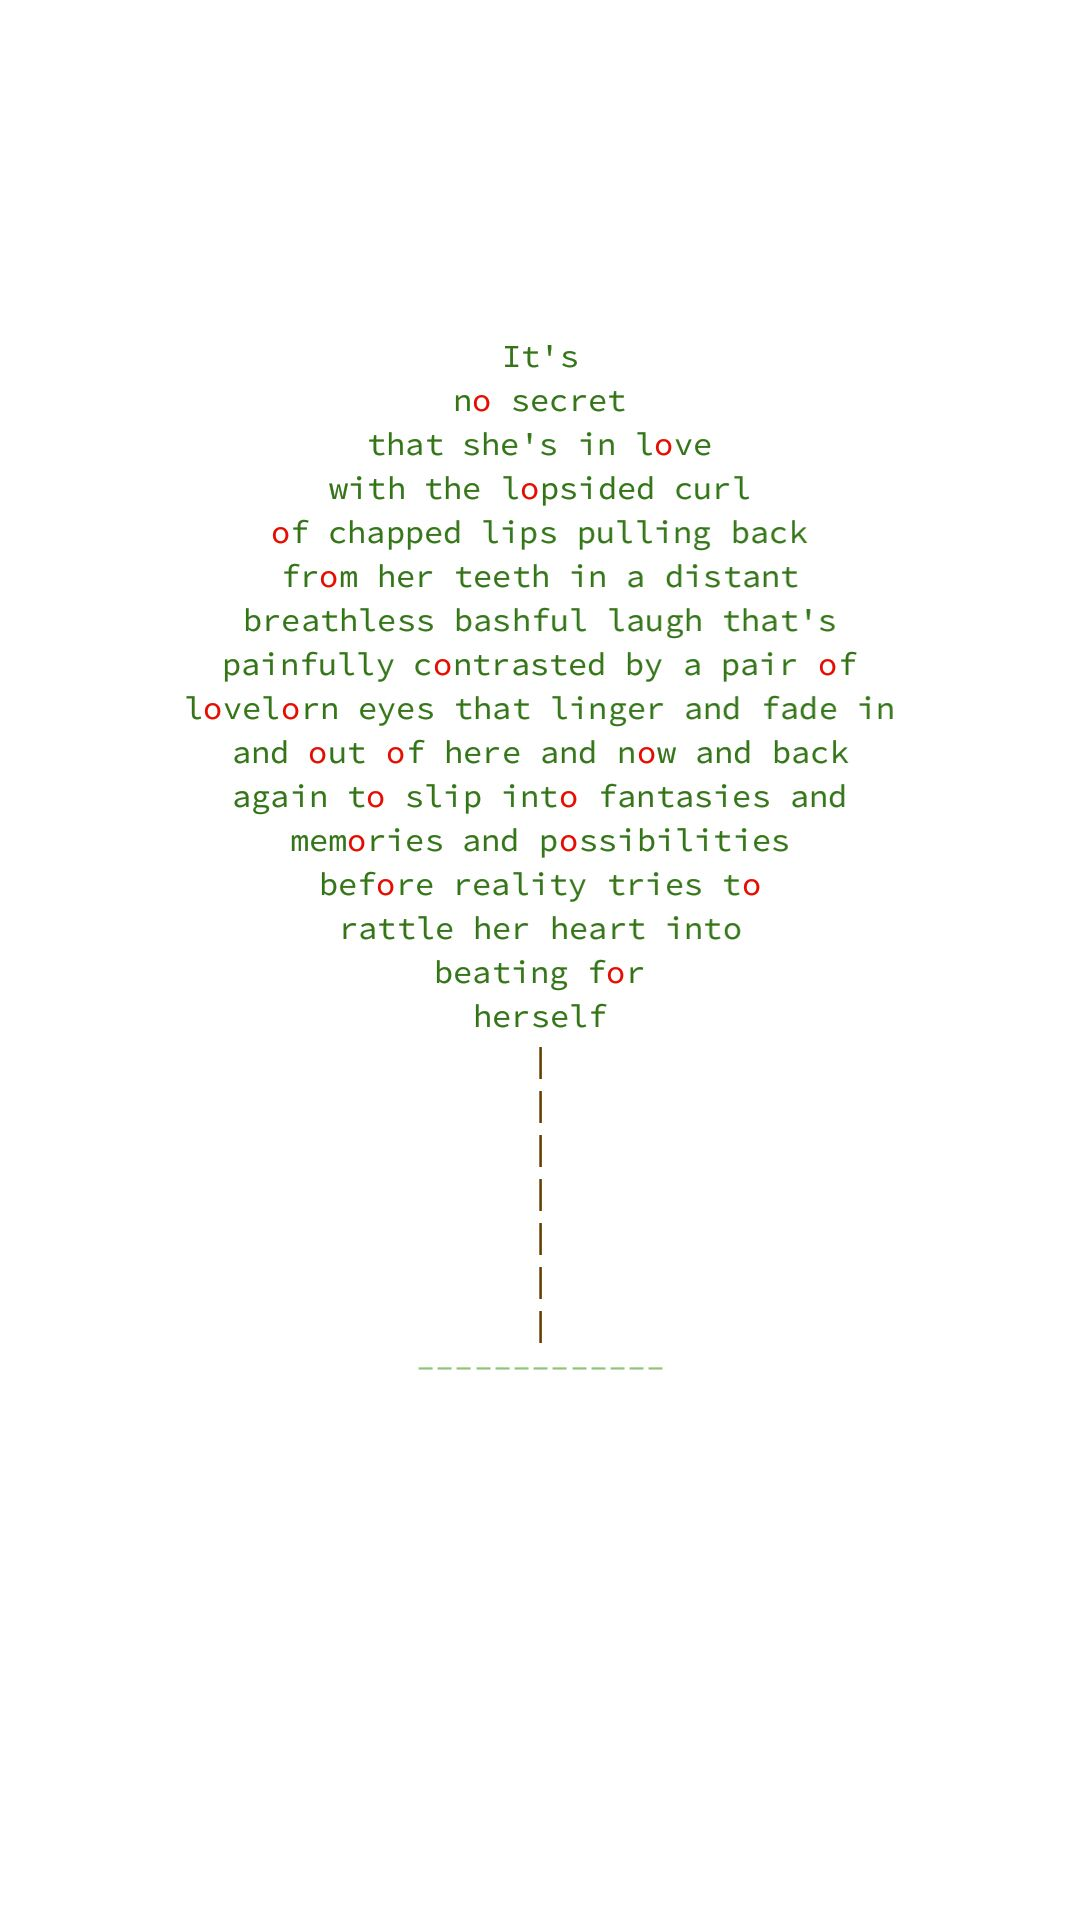 Gay and lesbian love poem